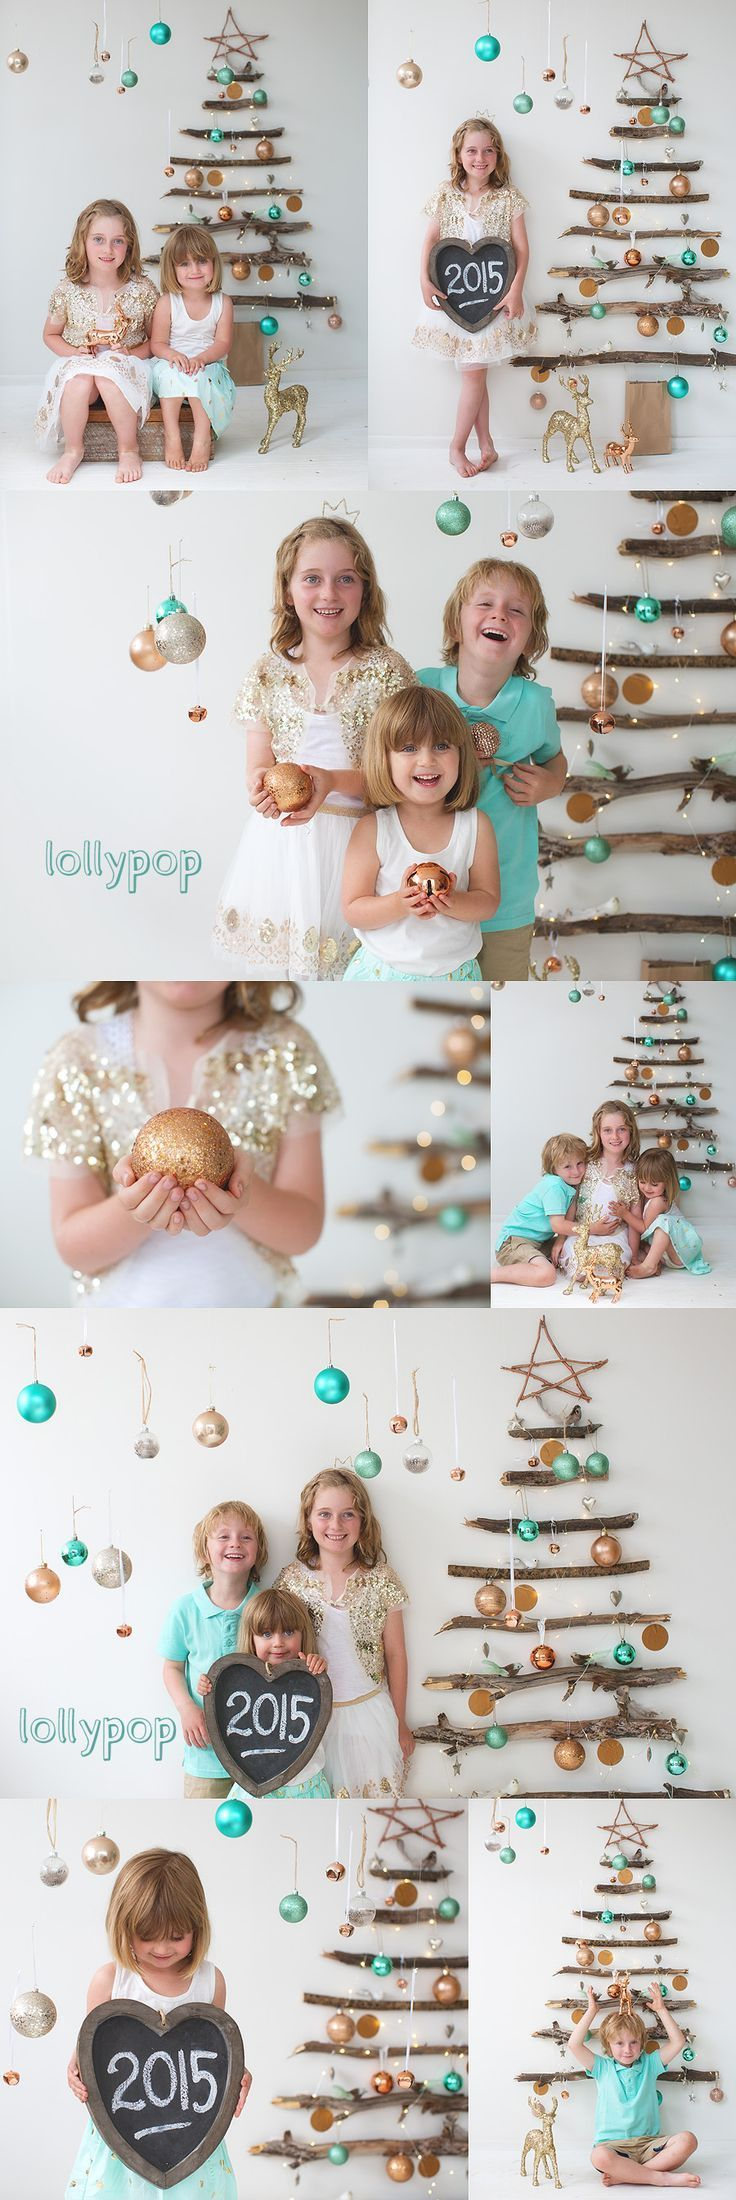 Znalezione obrazy dla zapytania white silver christmas photo session